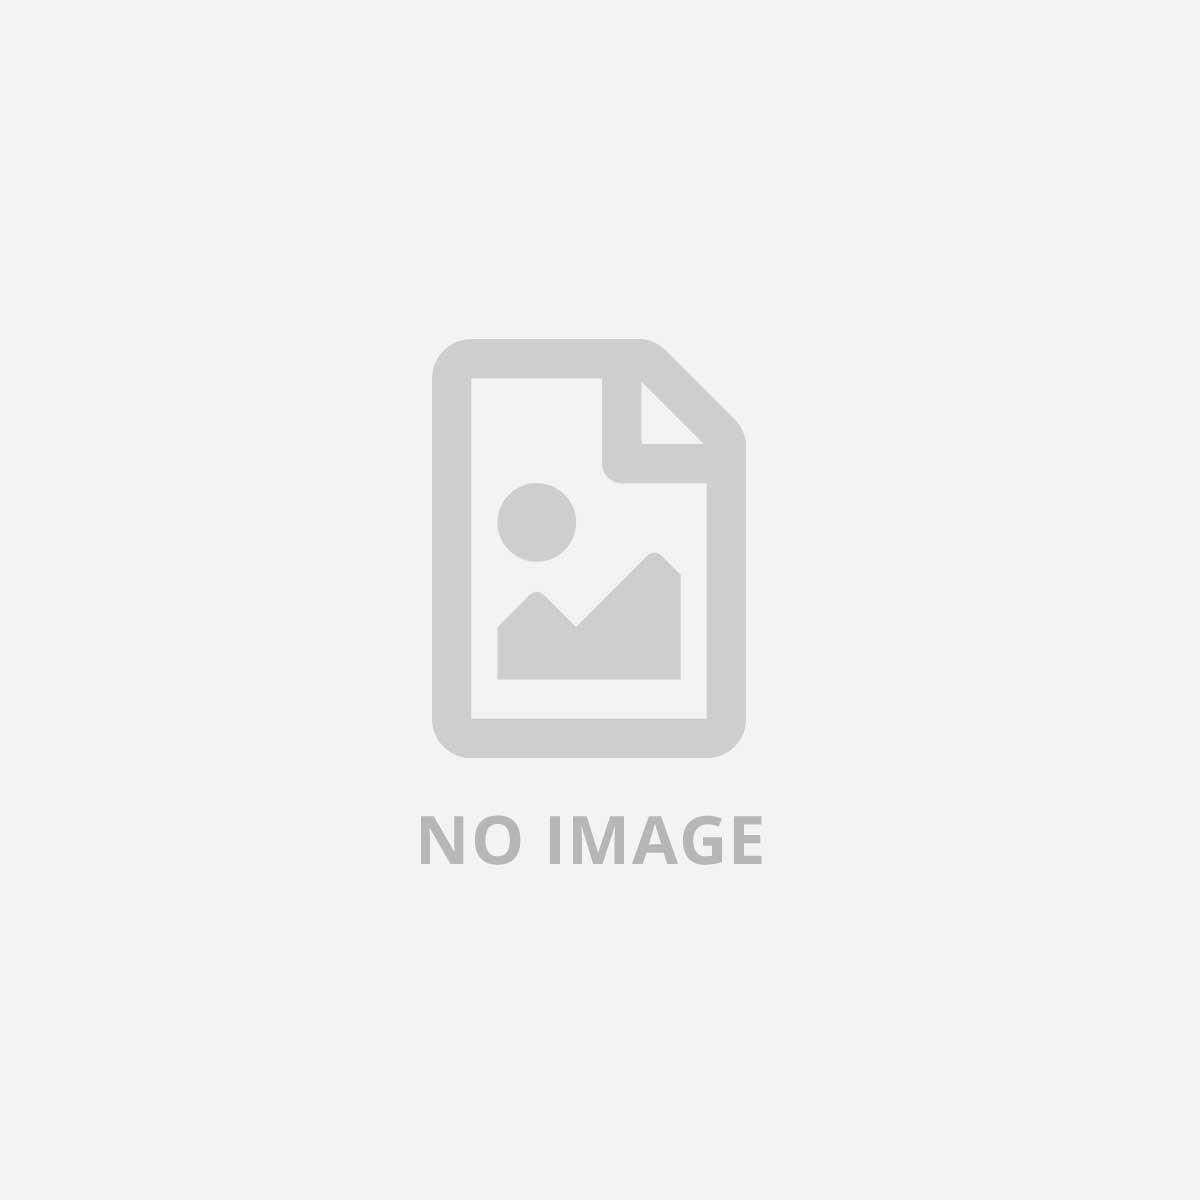 COREL EASY VHS TO DVD 3 PLUS